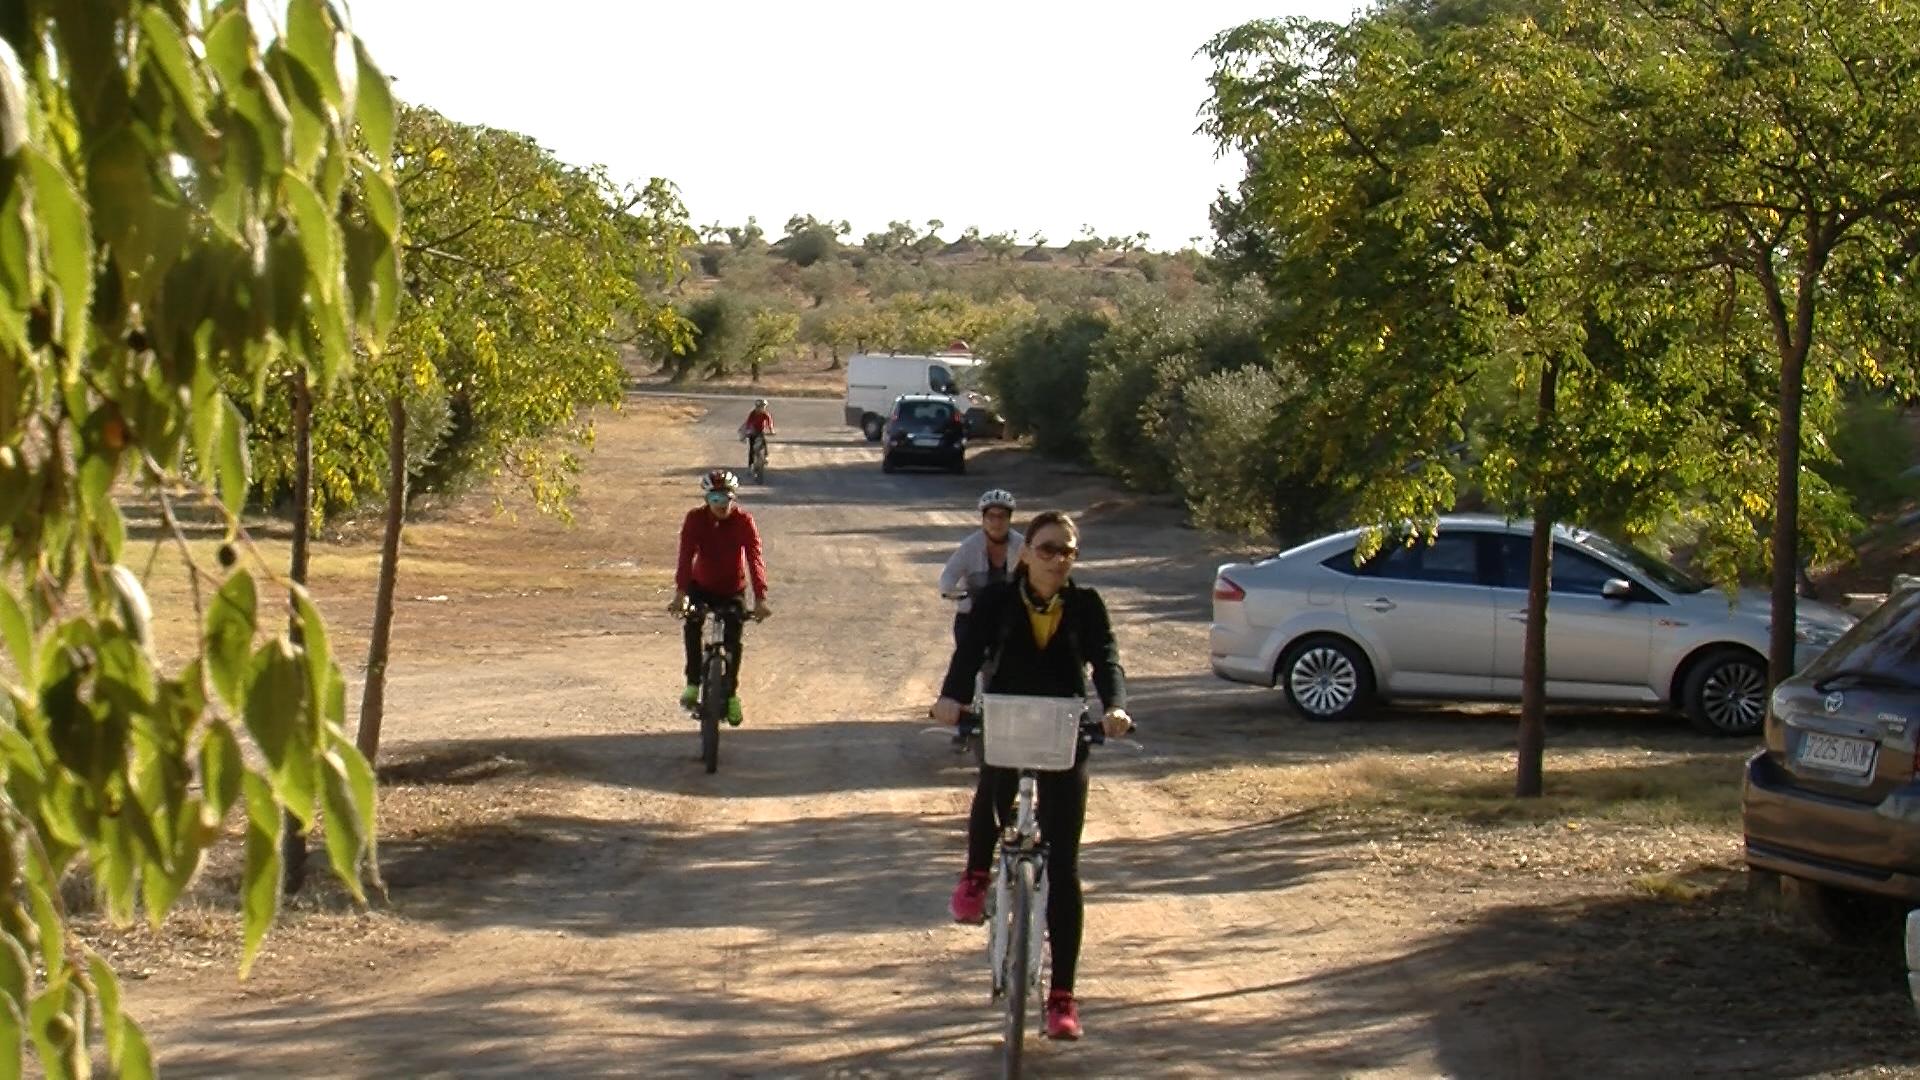 Dia Bicicleta.00_00_30_24.Imagen fija003